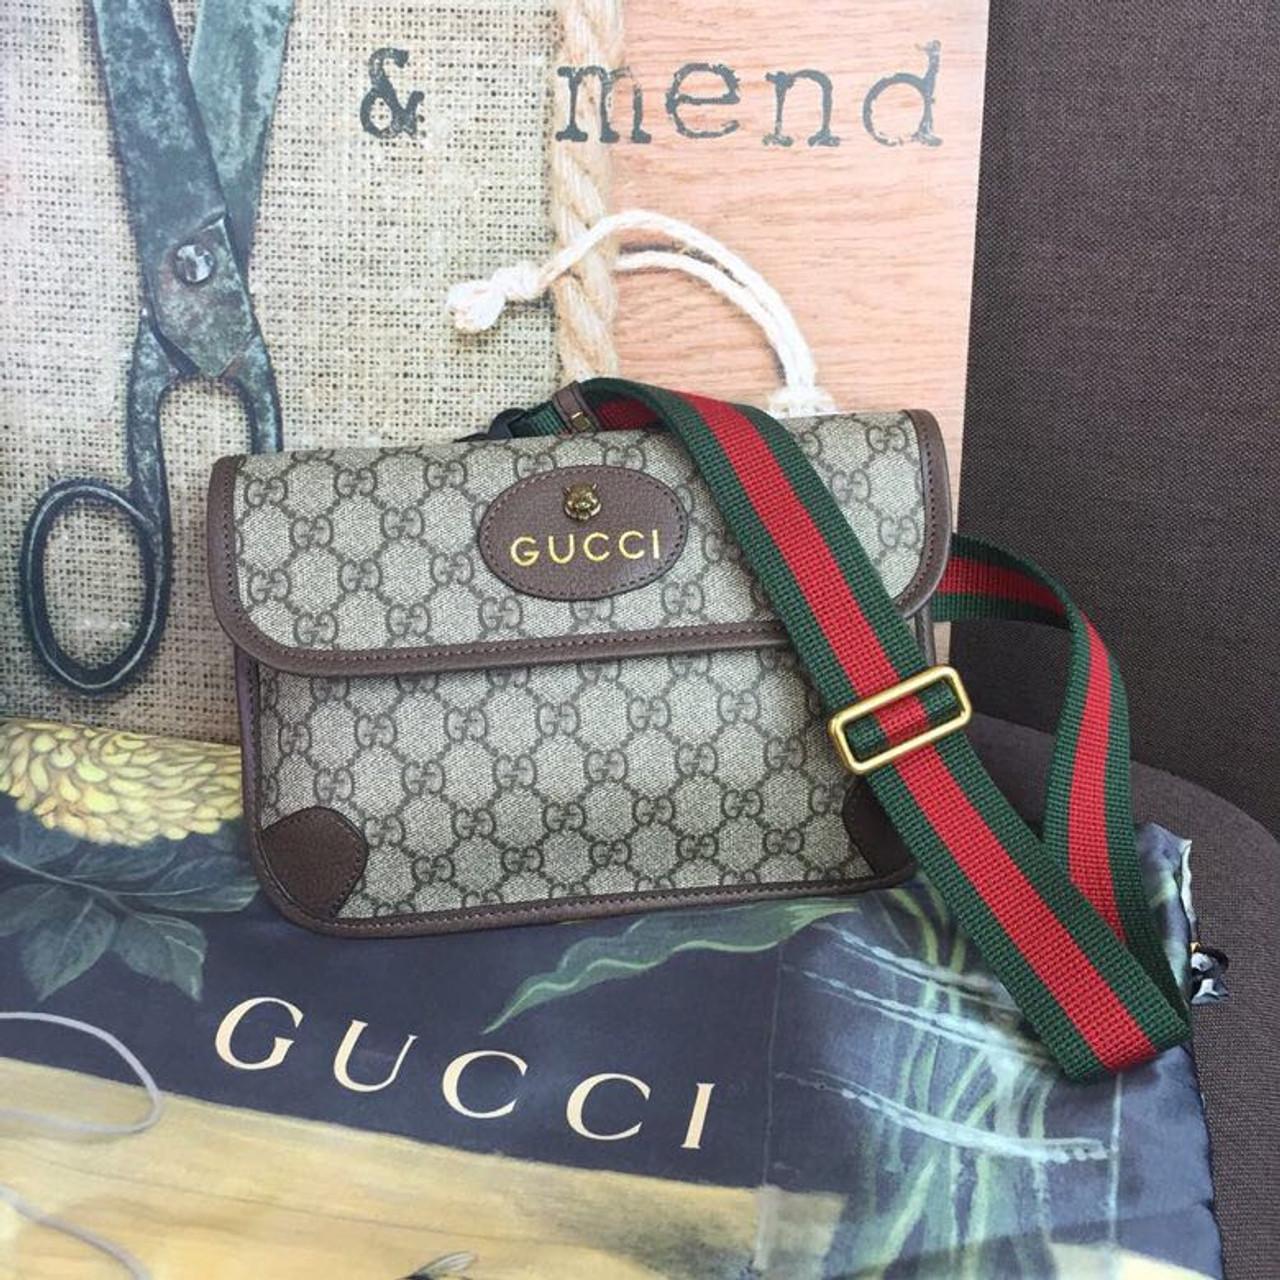 Gucci GG Supreme Waist Belt Bag 25cm 493930 Spring/Summer 2019 Collection,  Brown